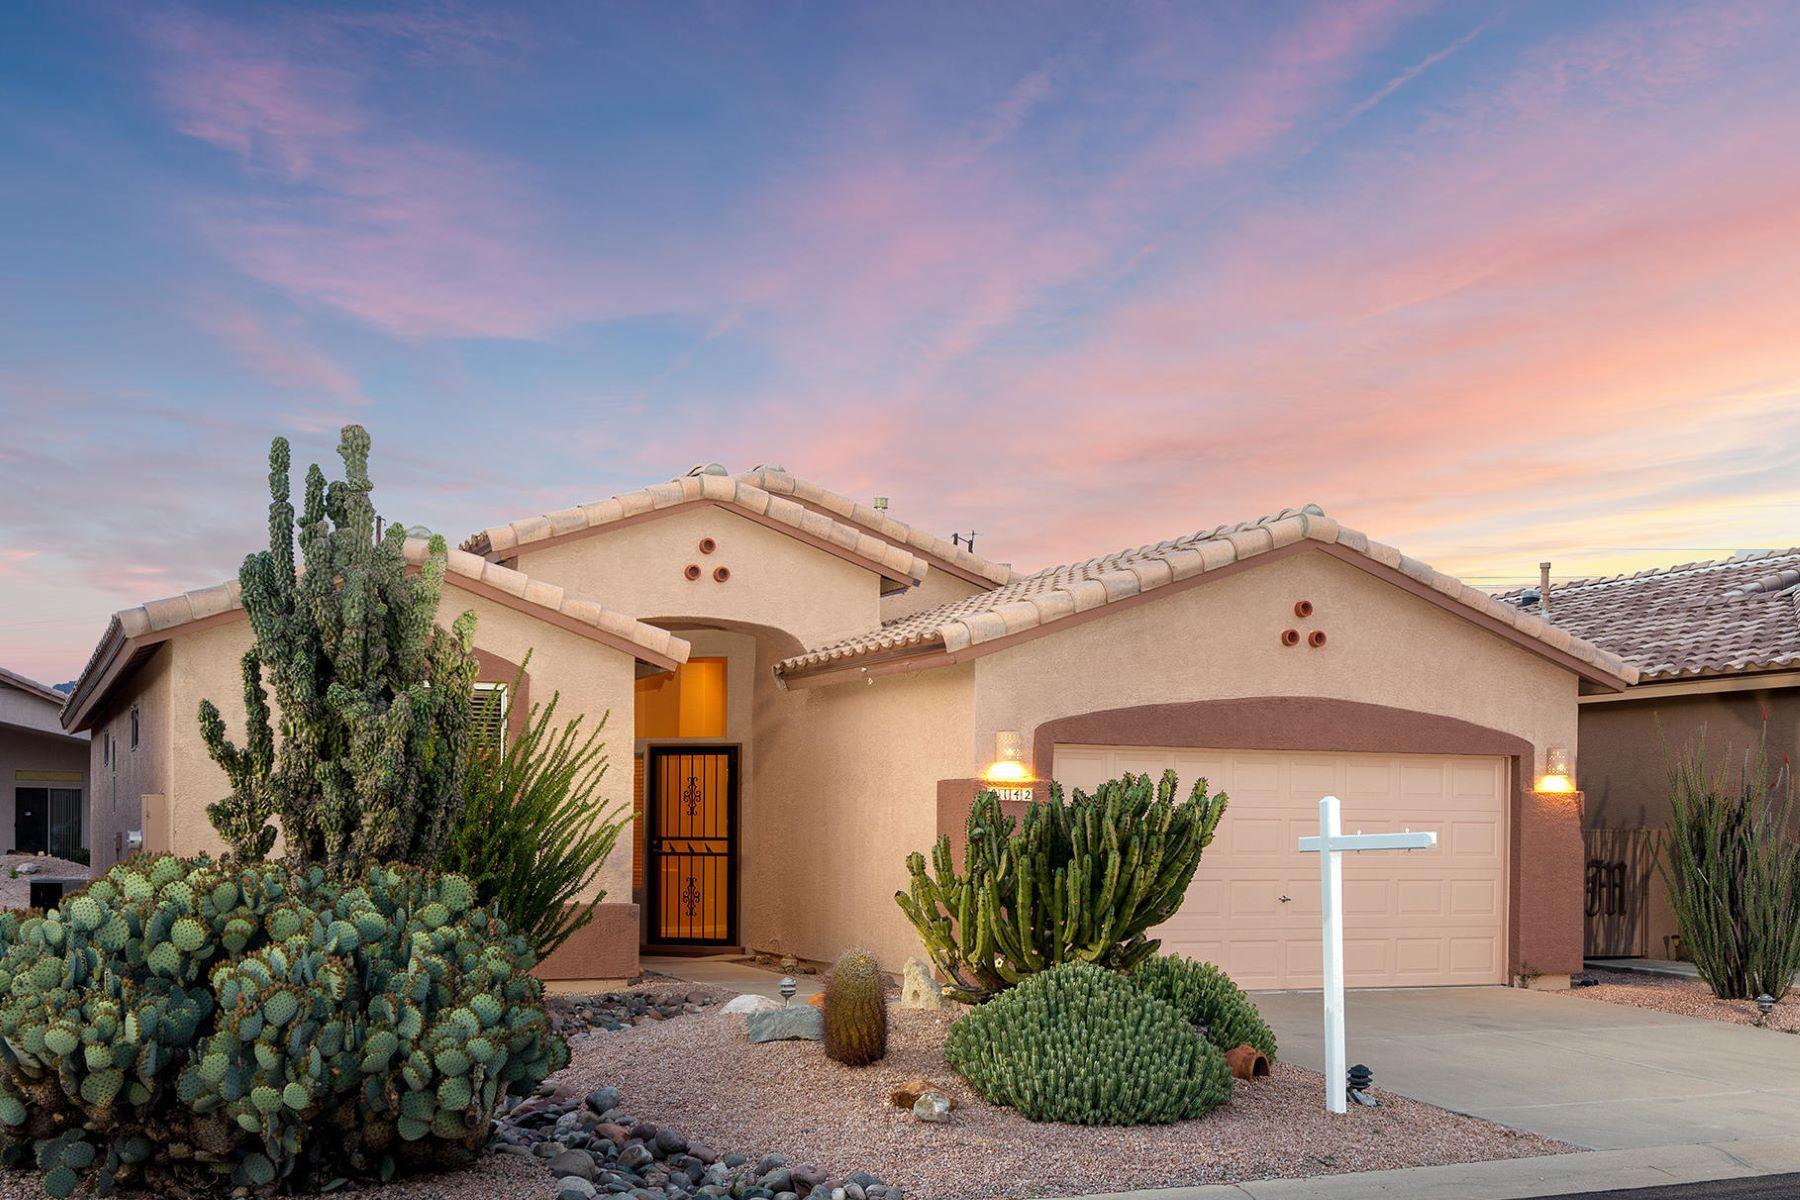 Single Family Homes για την Πώληση στο MountainBrook Village 8142 E Sand Wedge LN, Gold Canyon, Αριζονα 85118 Ηνωμένες Πολιτείες